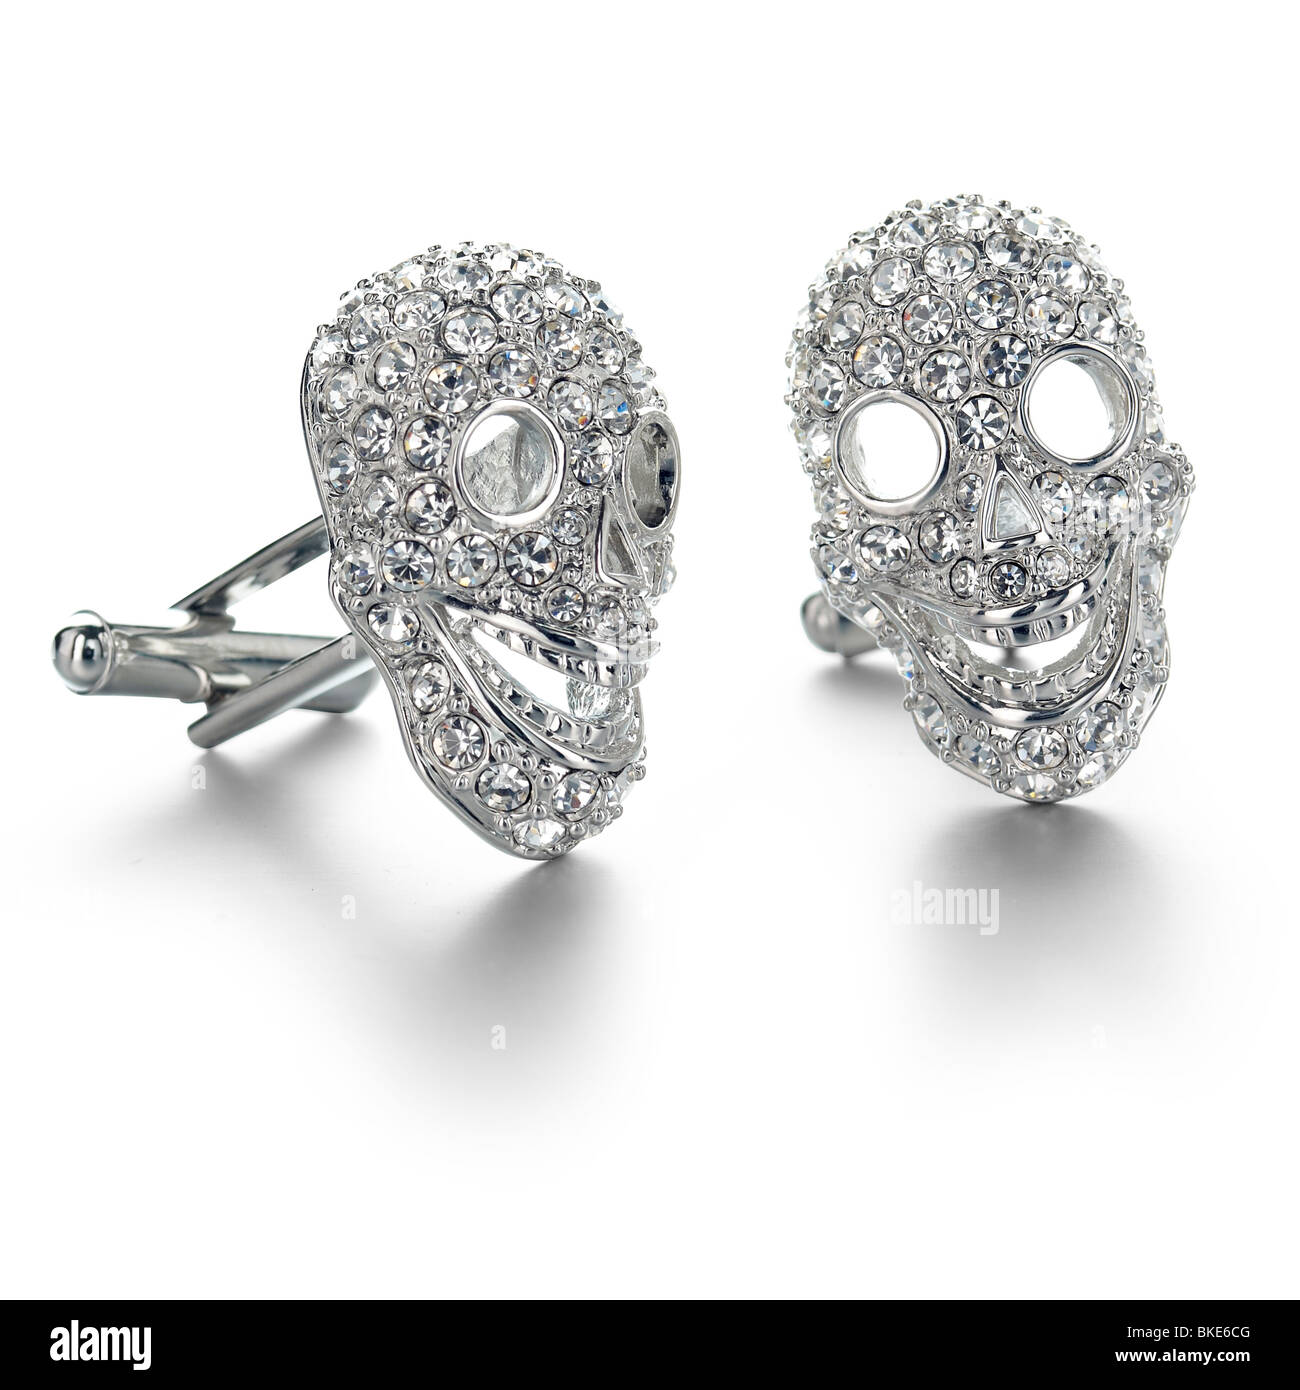 Skull cuff links - Stock Image